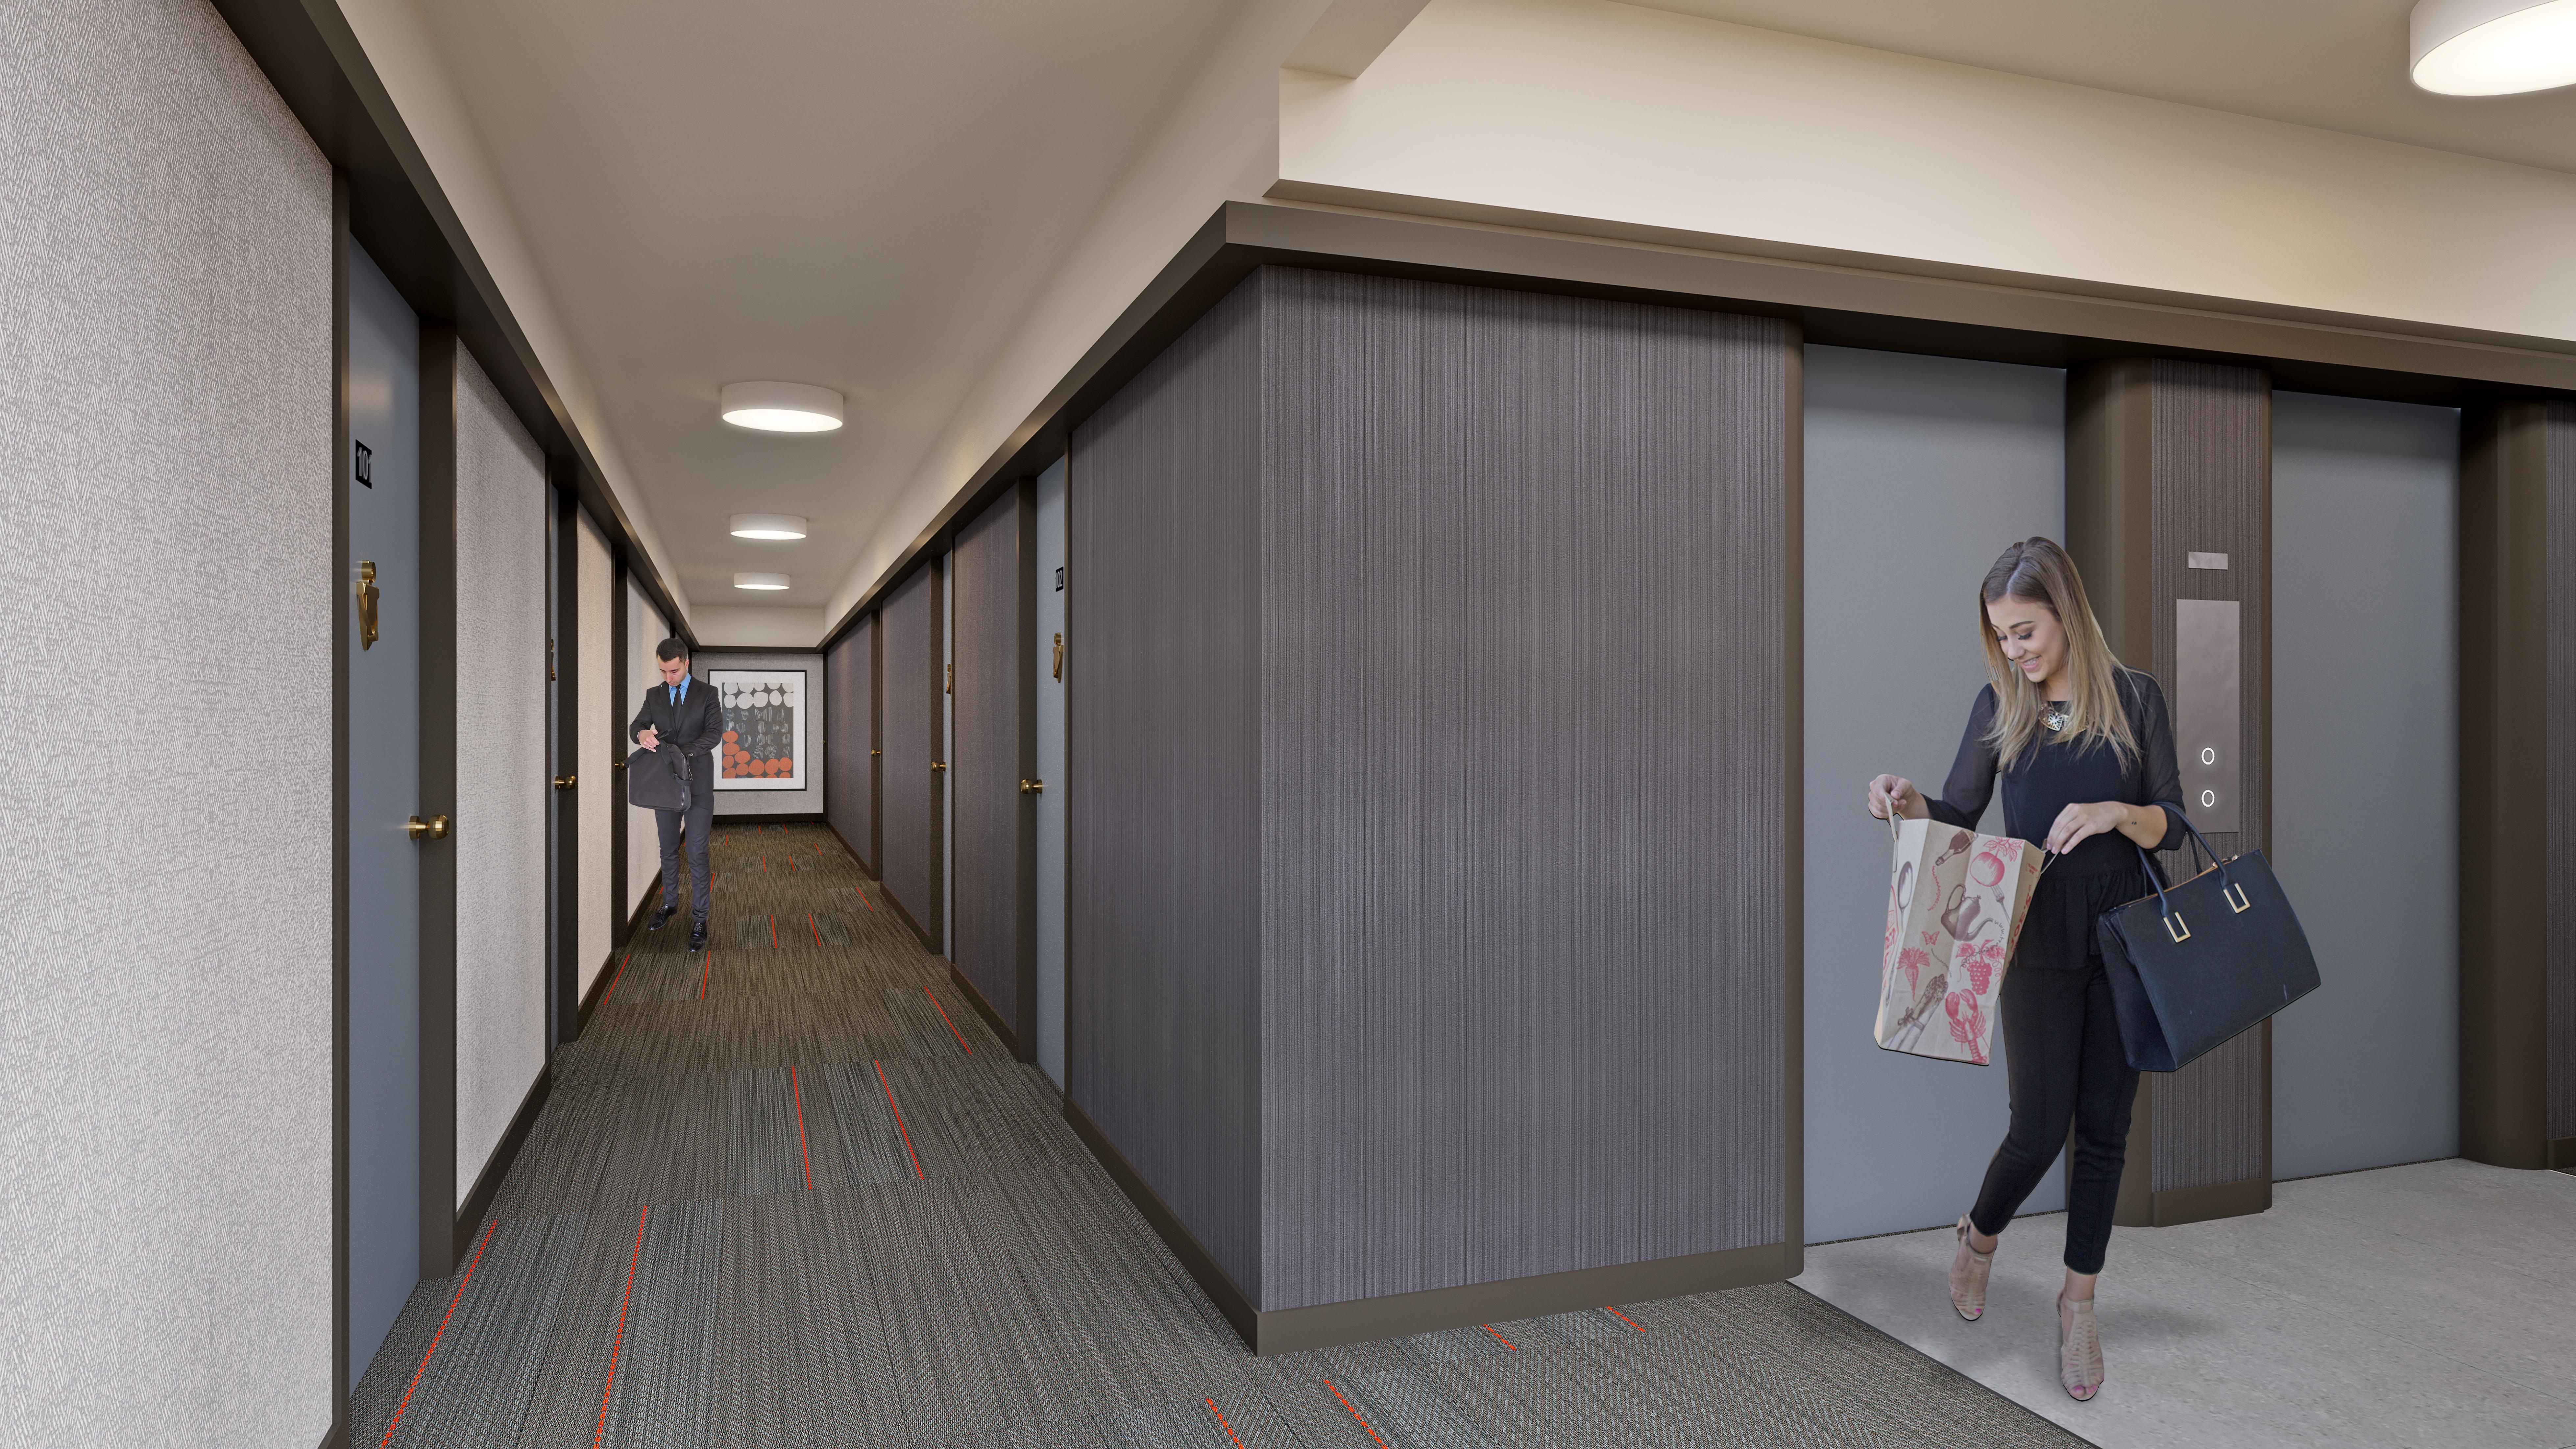 DC Lobby & Hallway - 3